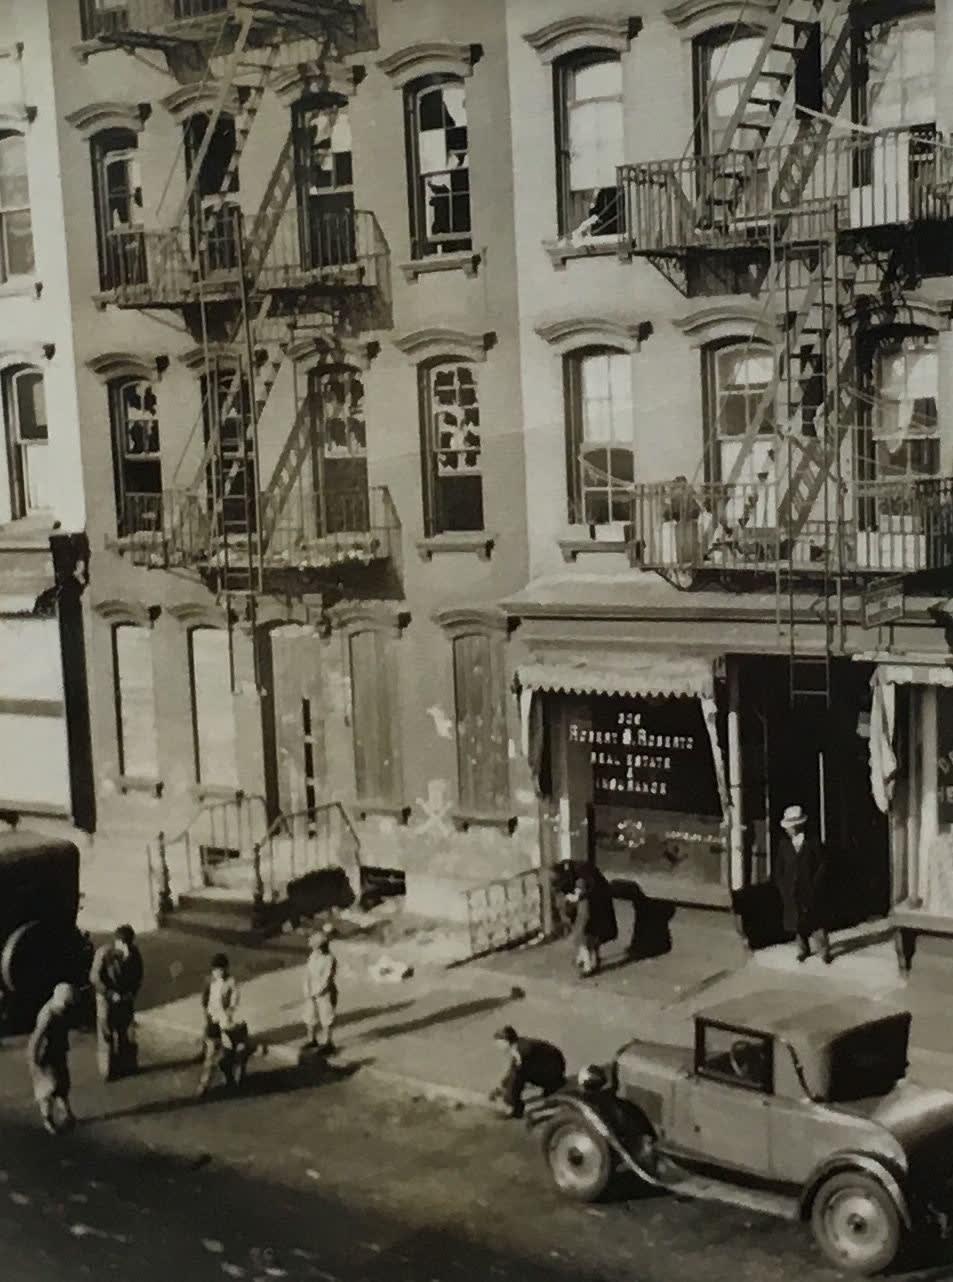 Fred Zinnemann Untitled [view of street], 1932 Vintage gelatin silver print 4 x 3 1/8 inches